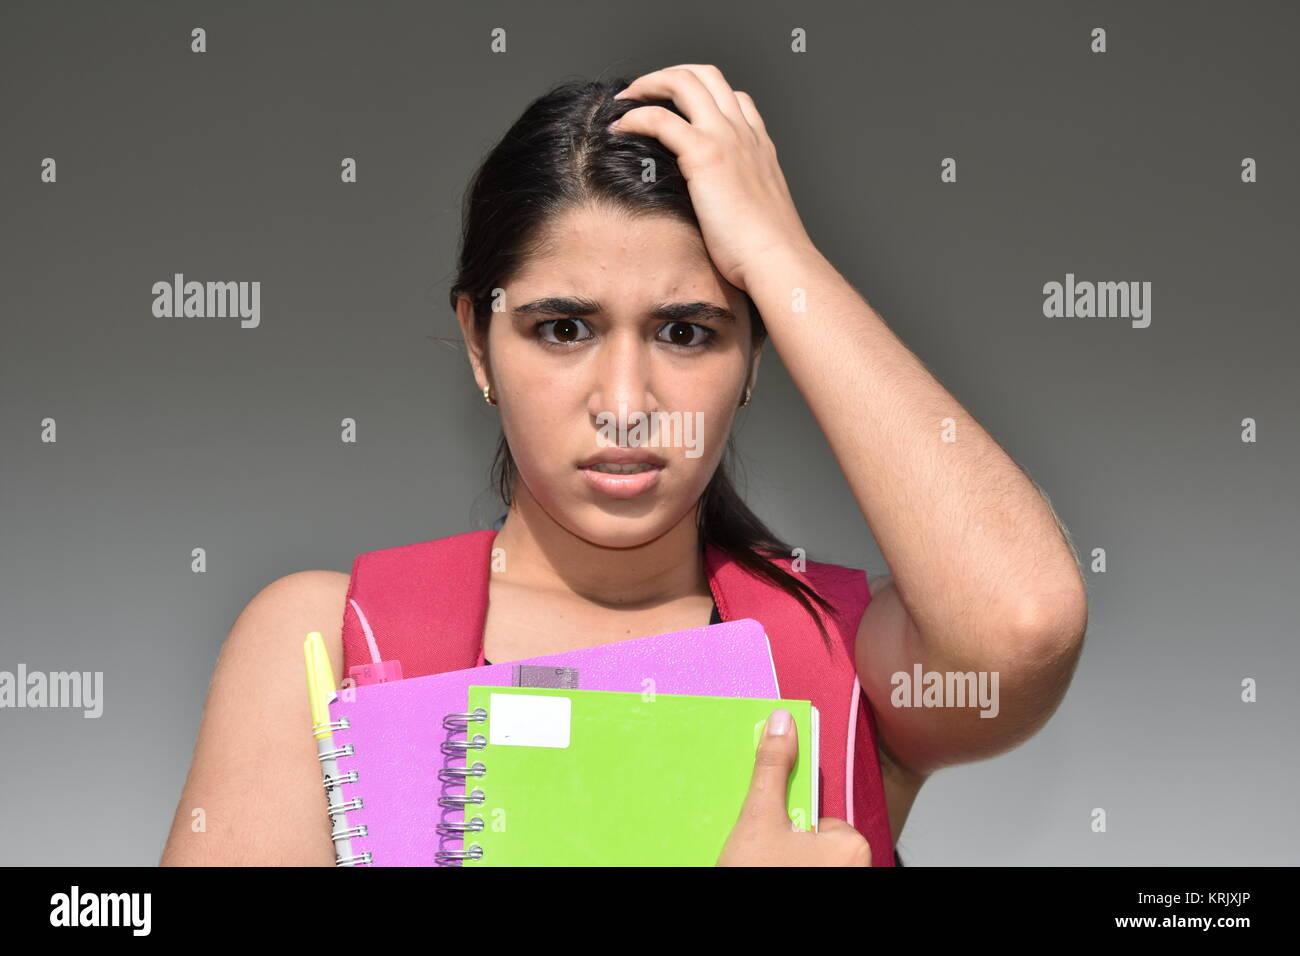 Stressful Female Student - Stock Image